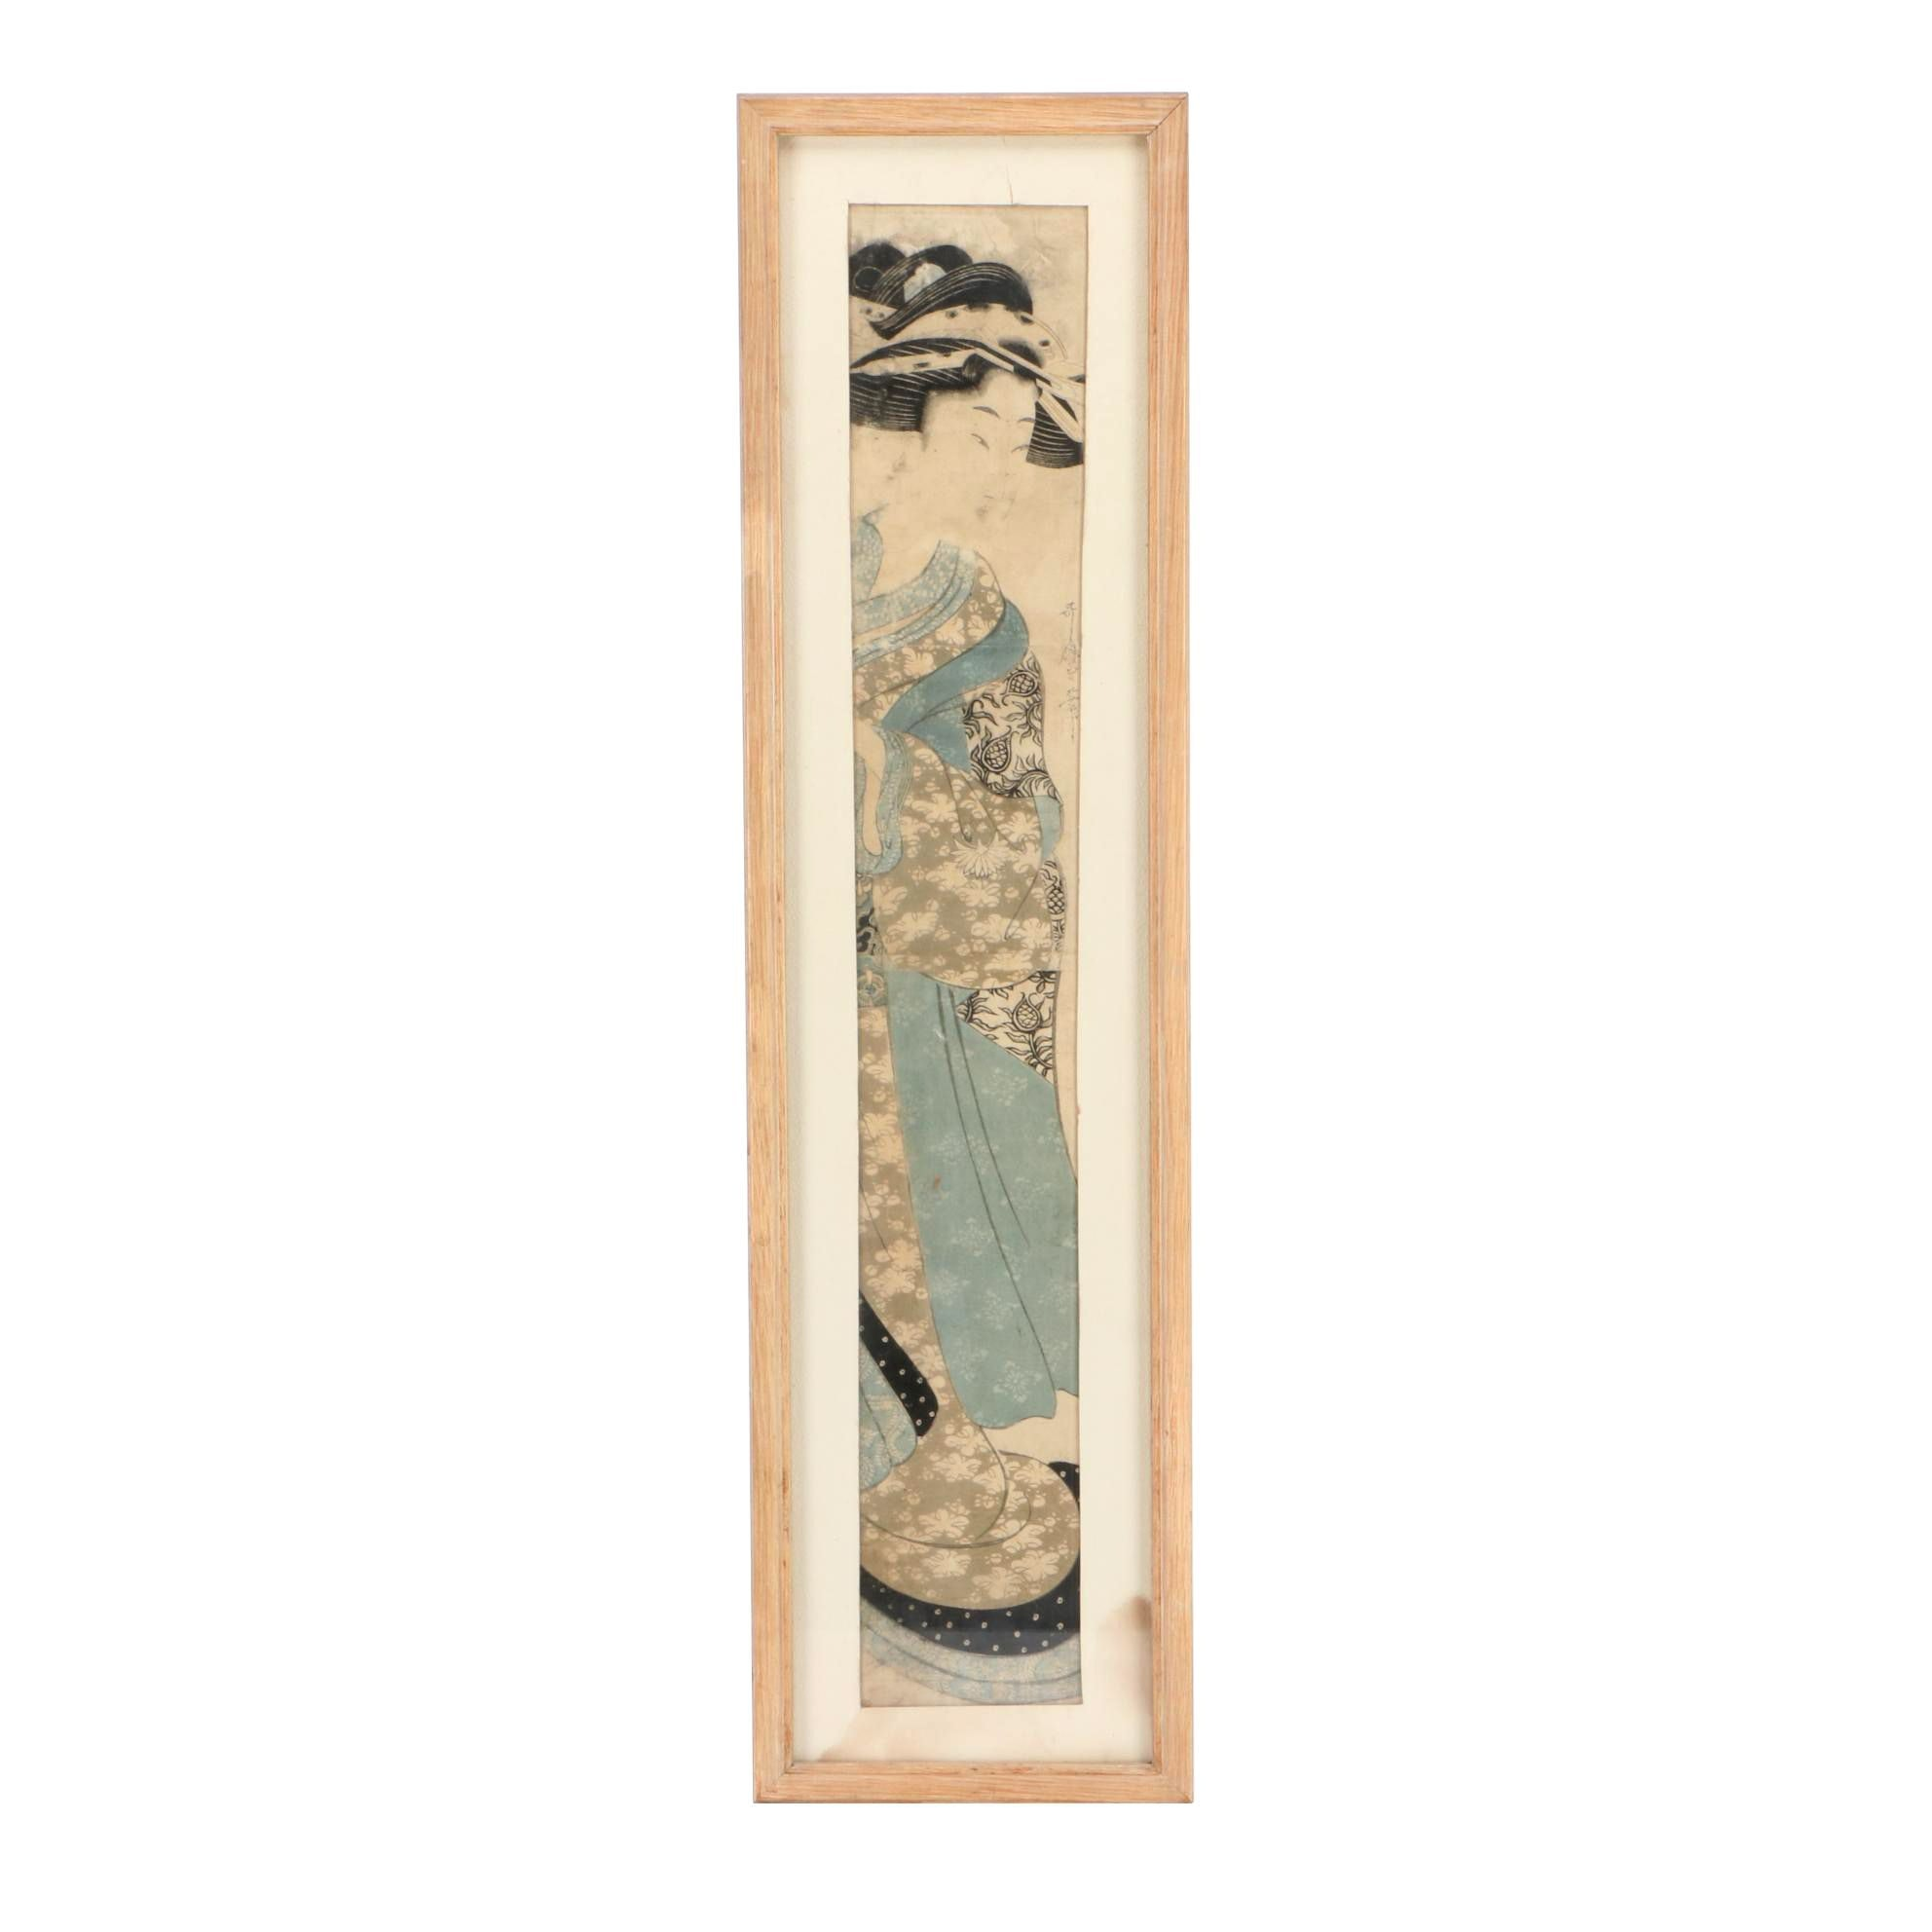 Utamaro Hashira-e Woodblock Bijin Portrait